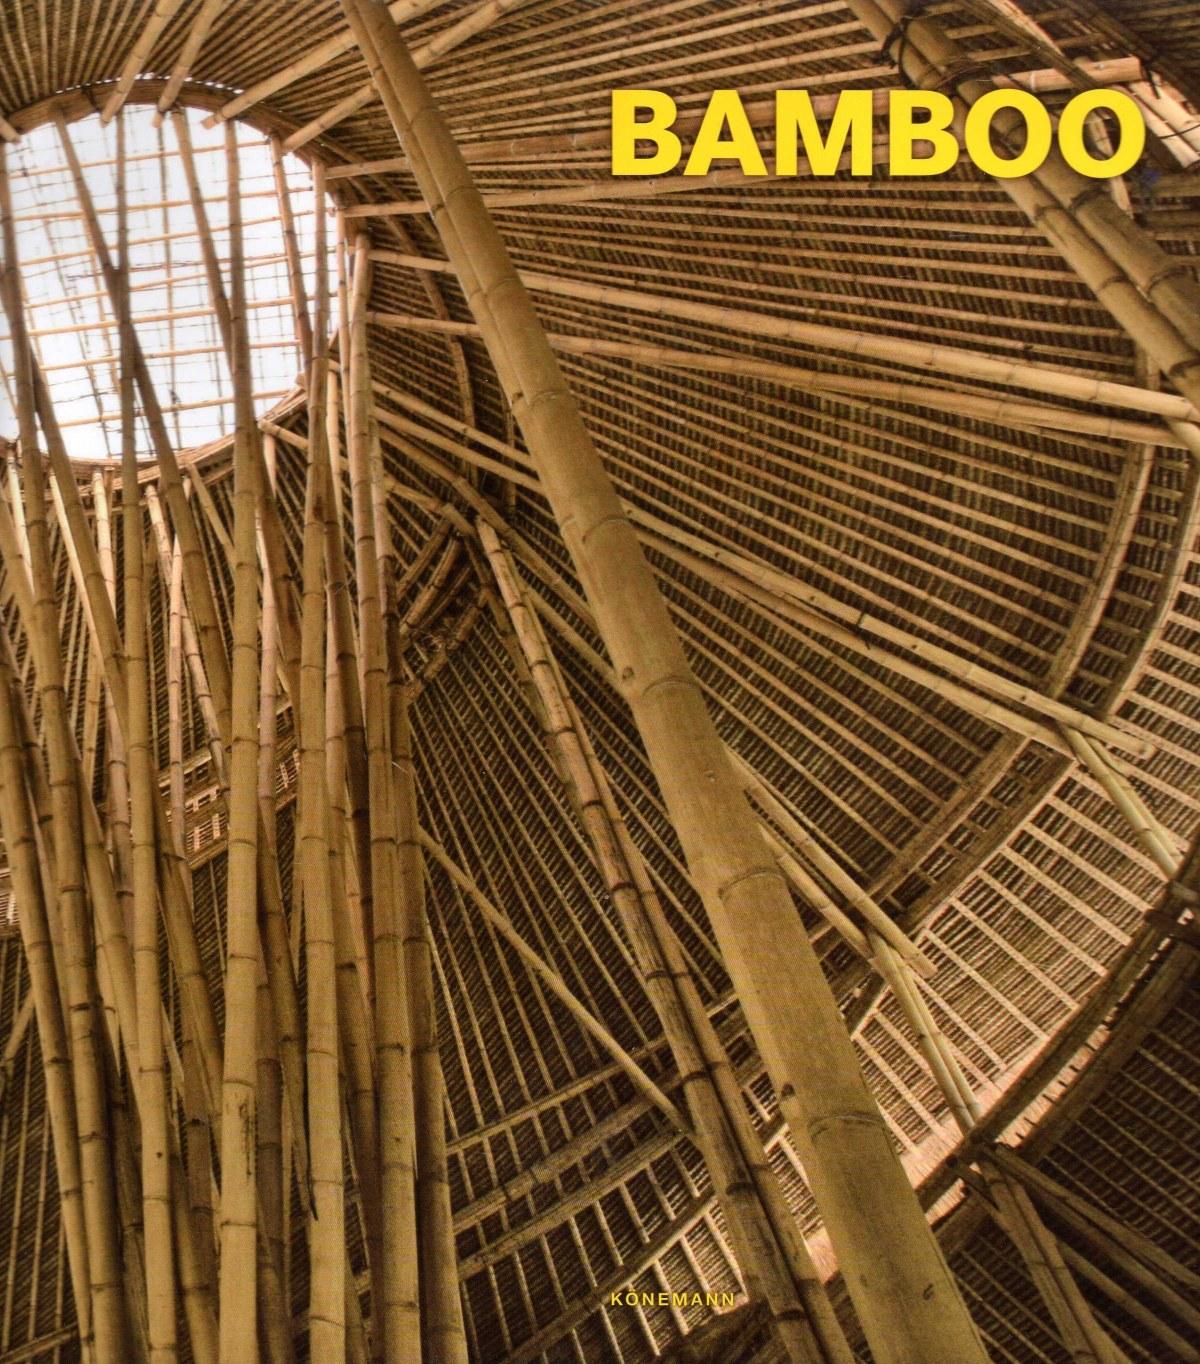 BAMBOO 9783741914003